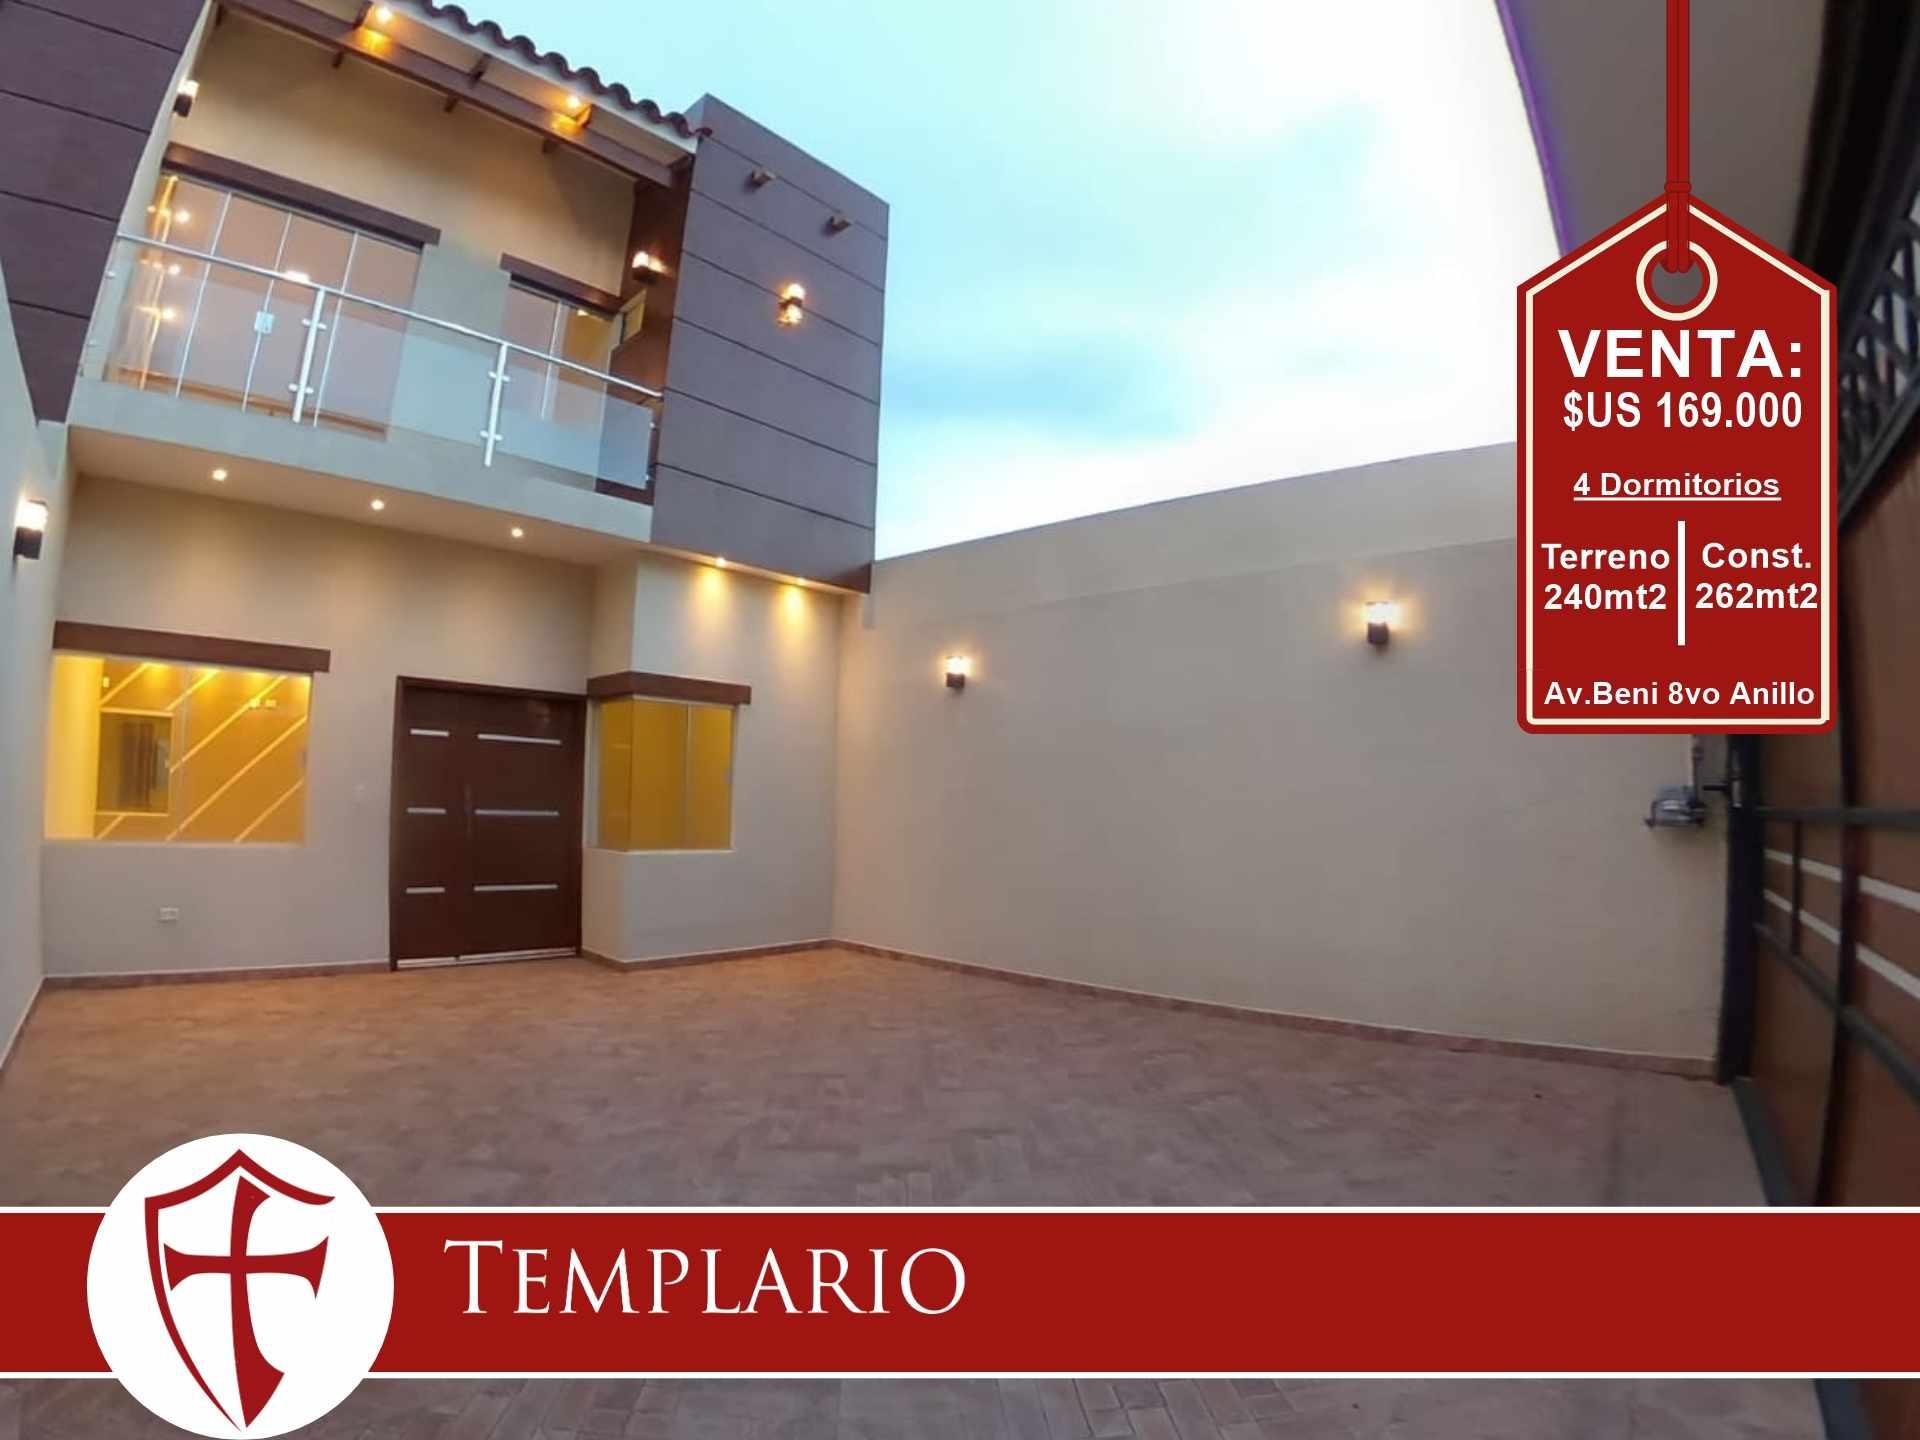 Casa en Venta Av. Beni 8vo Anillo - Zona Norte Foto 16